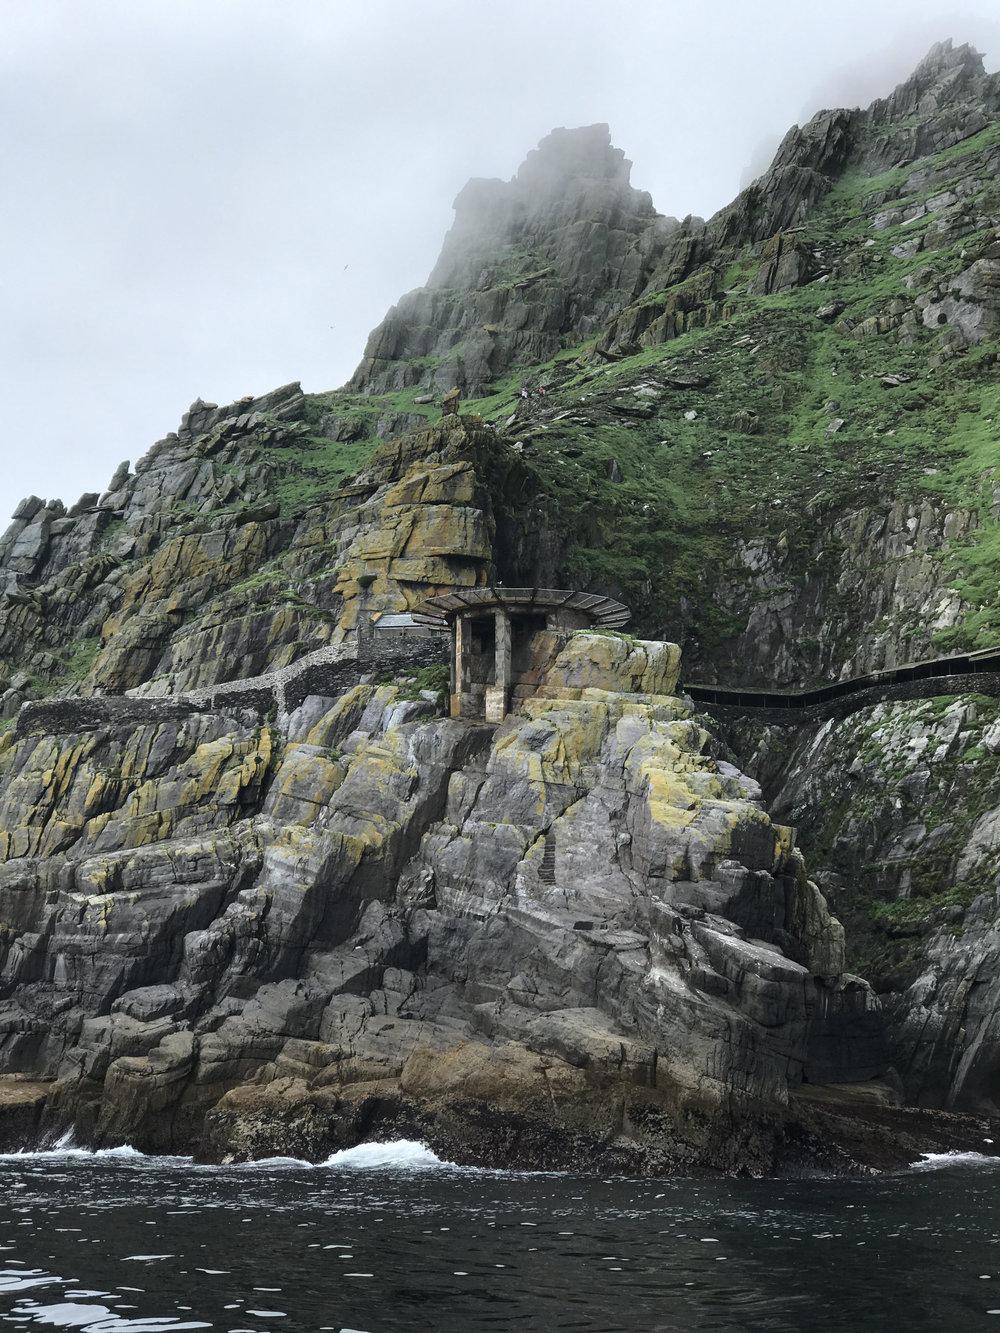 Skellig Michael, where Star Wars was filmed